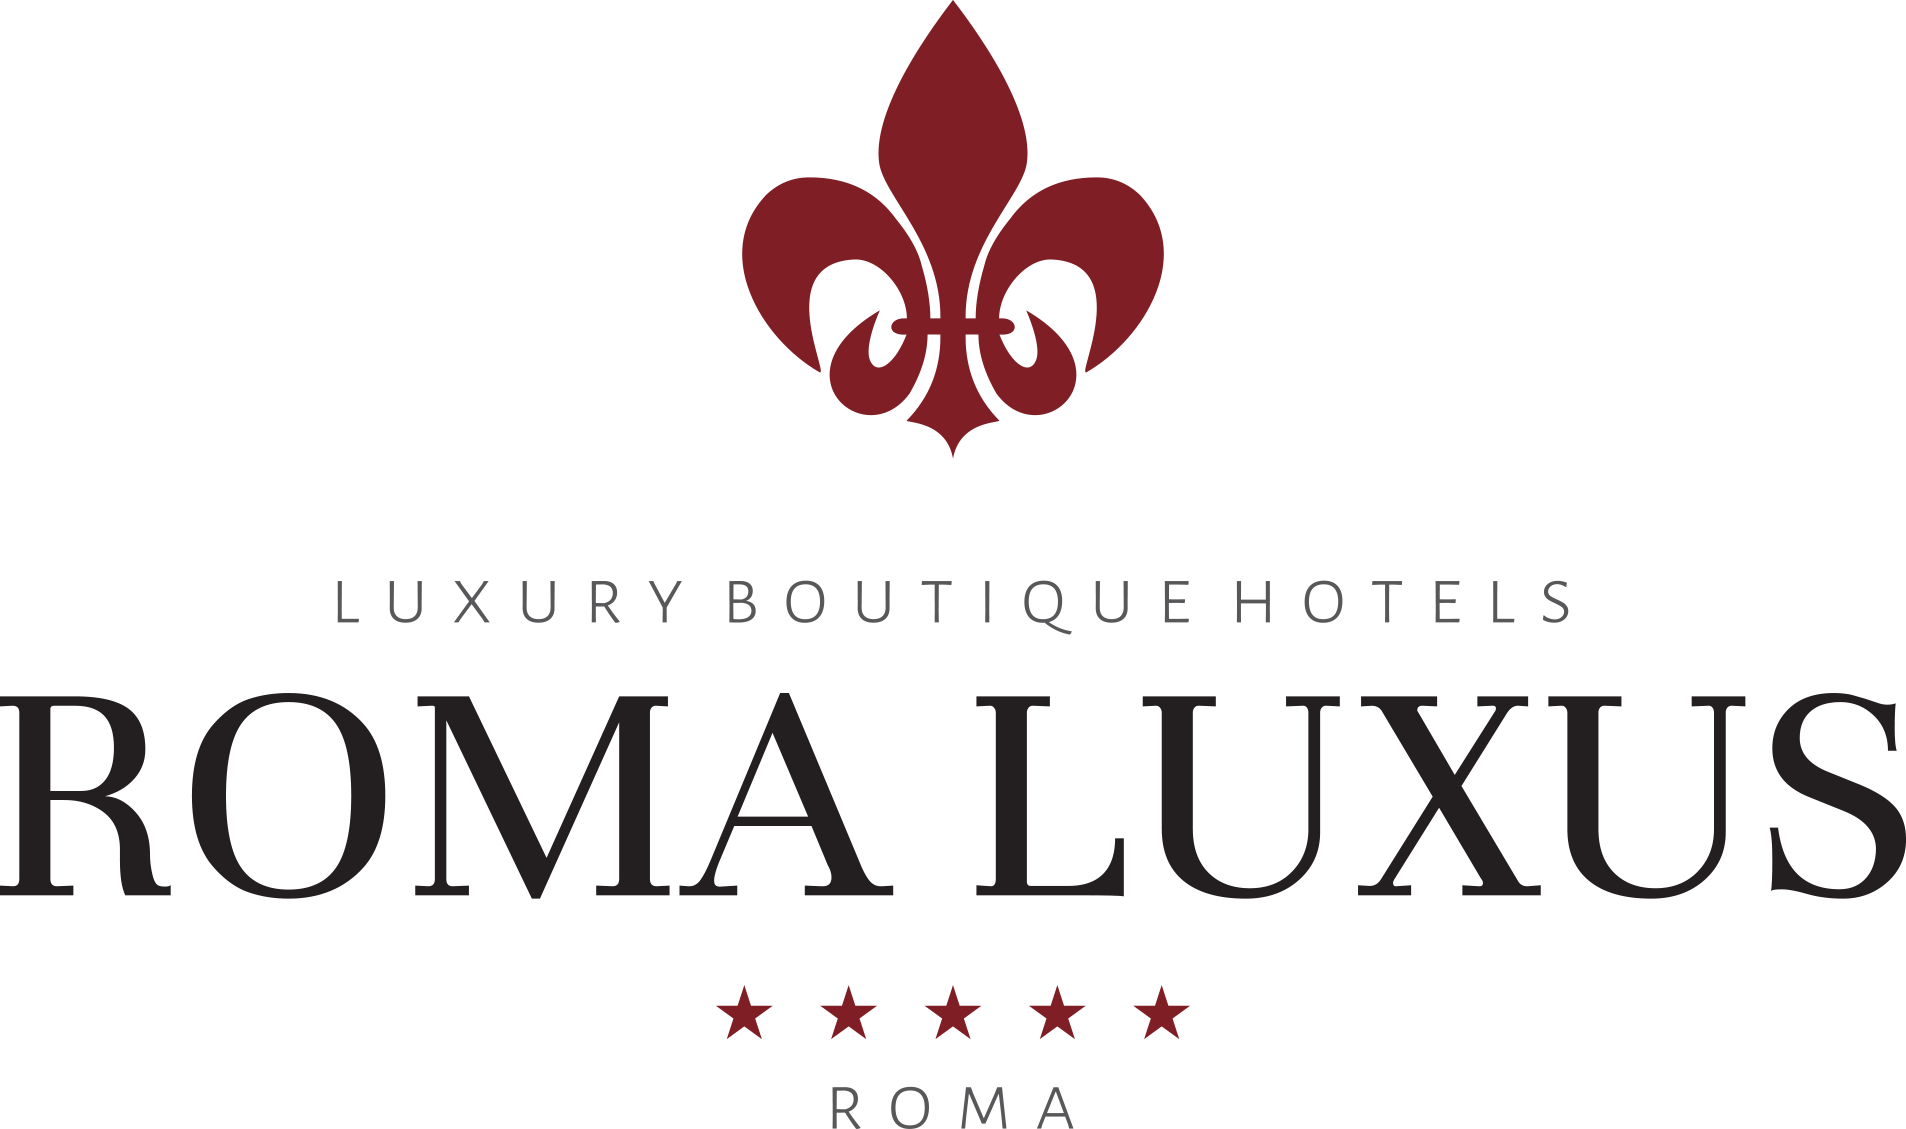 Roma Luxus